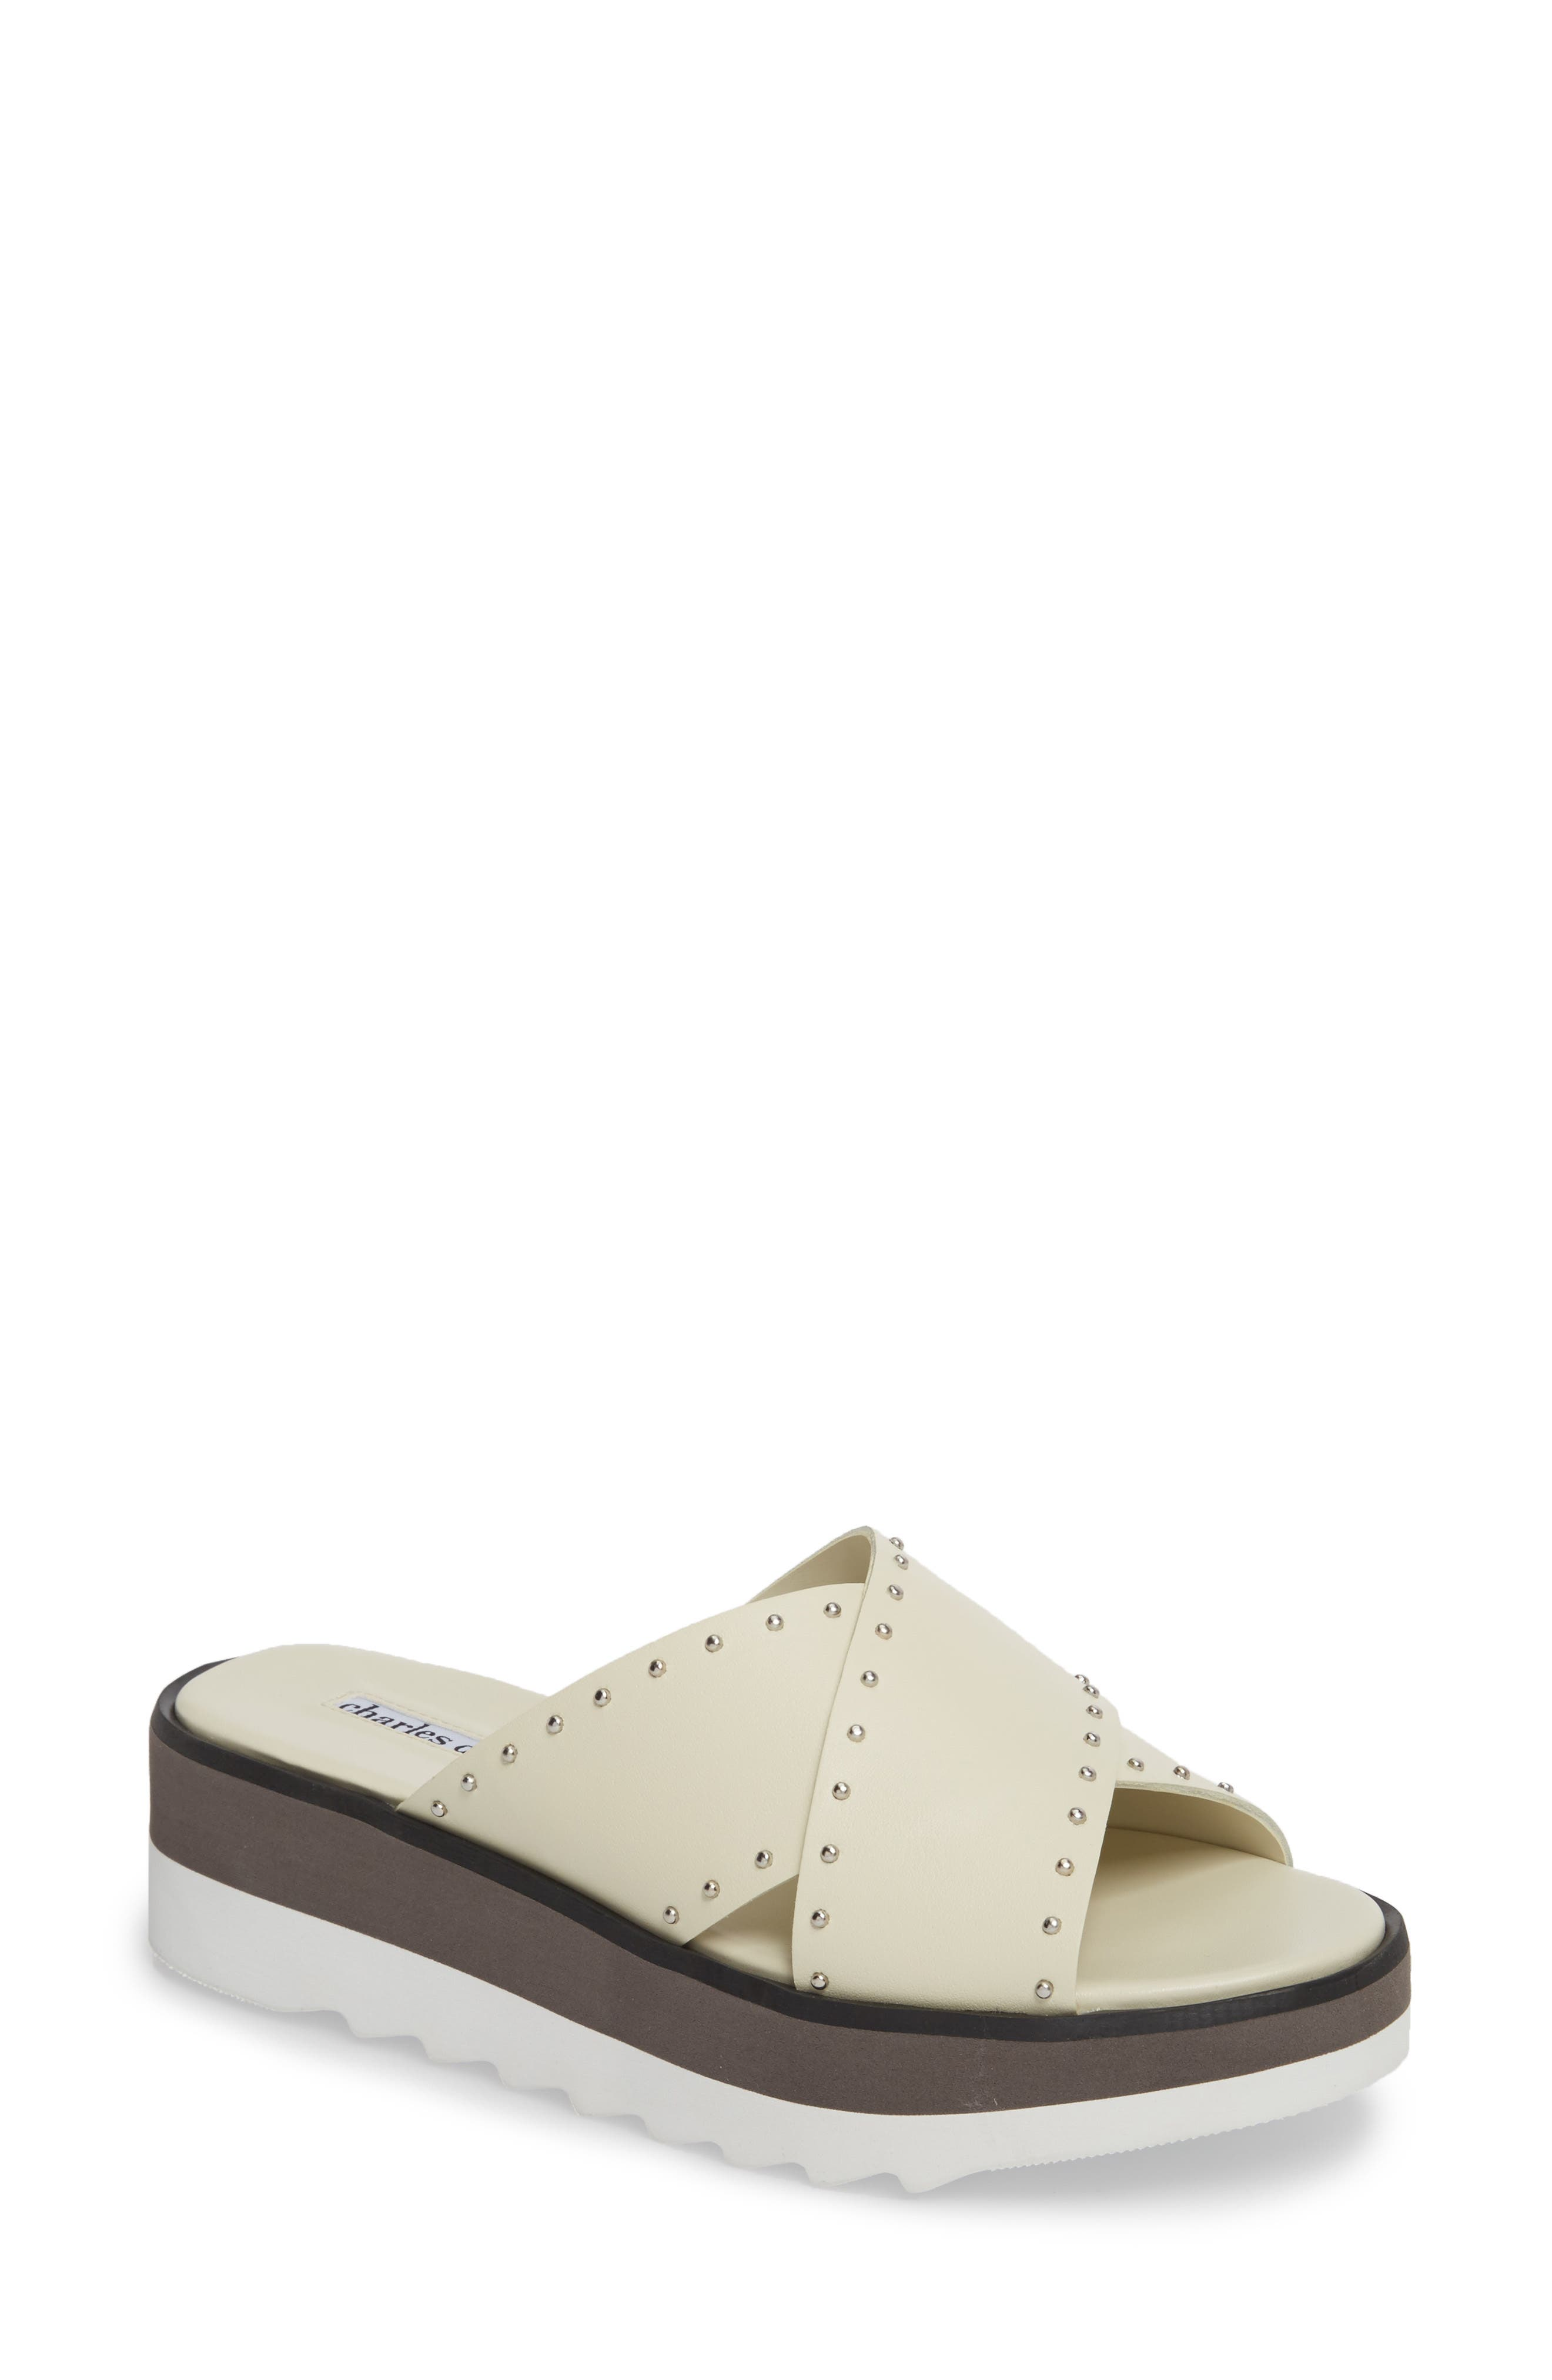 Buxom Sandal, Main, color, WHITE LEATHER